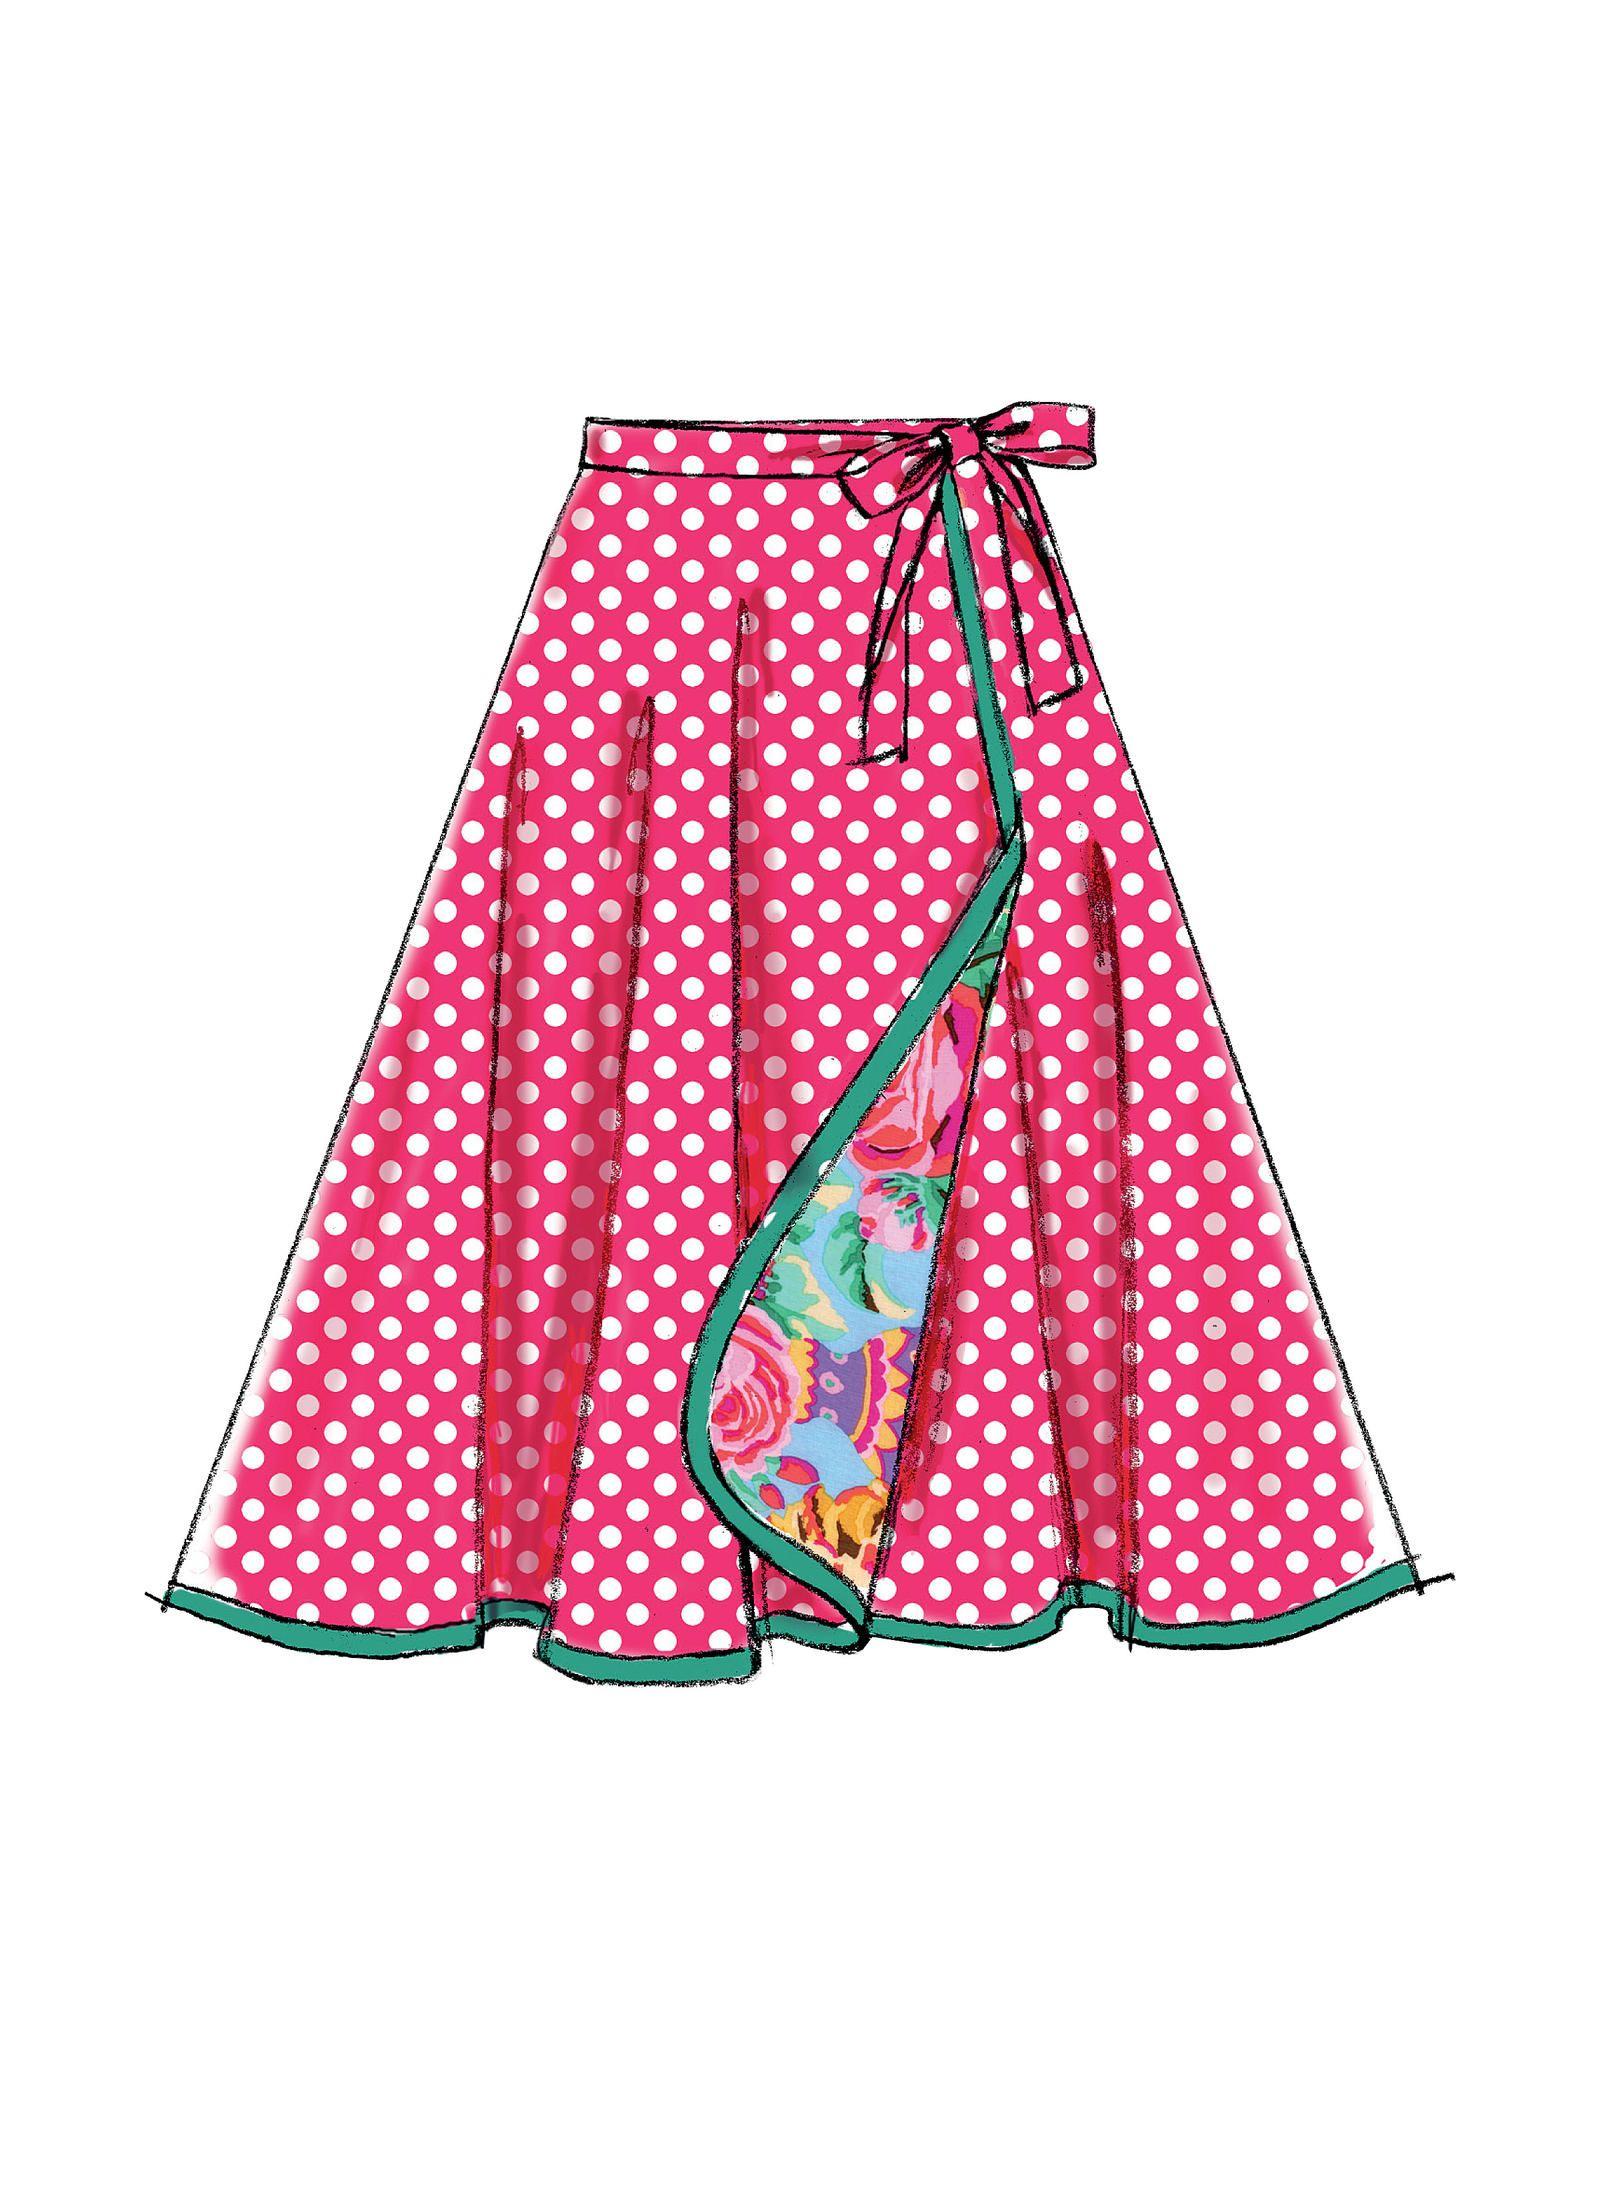 Mccalls Sewing Pattern M7129 misses/'s faldas